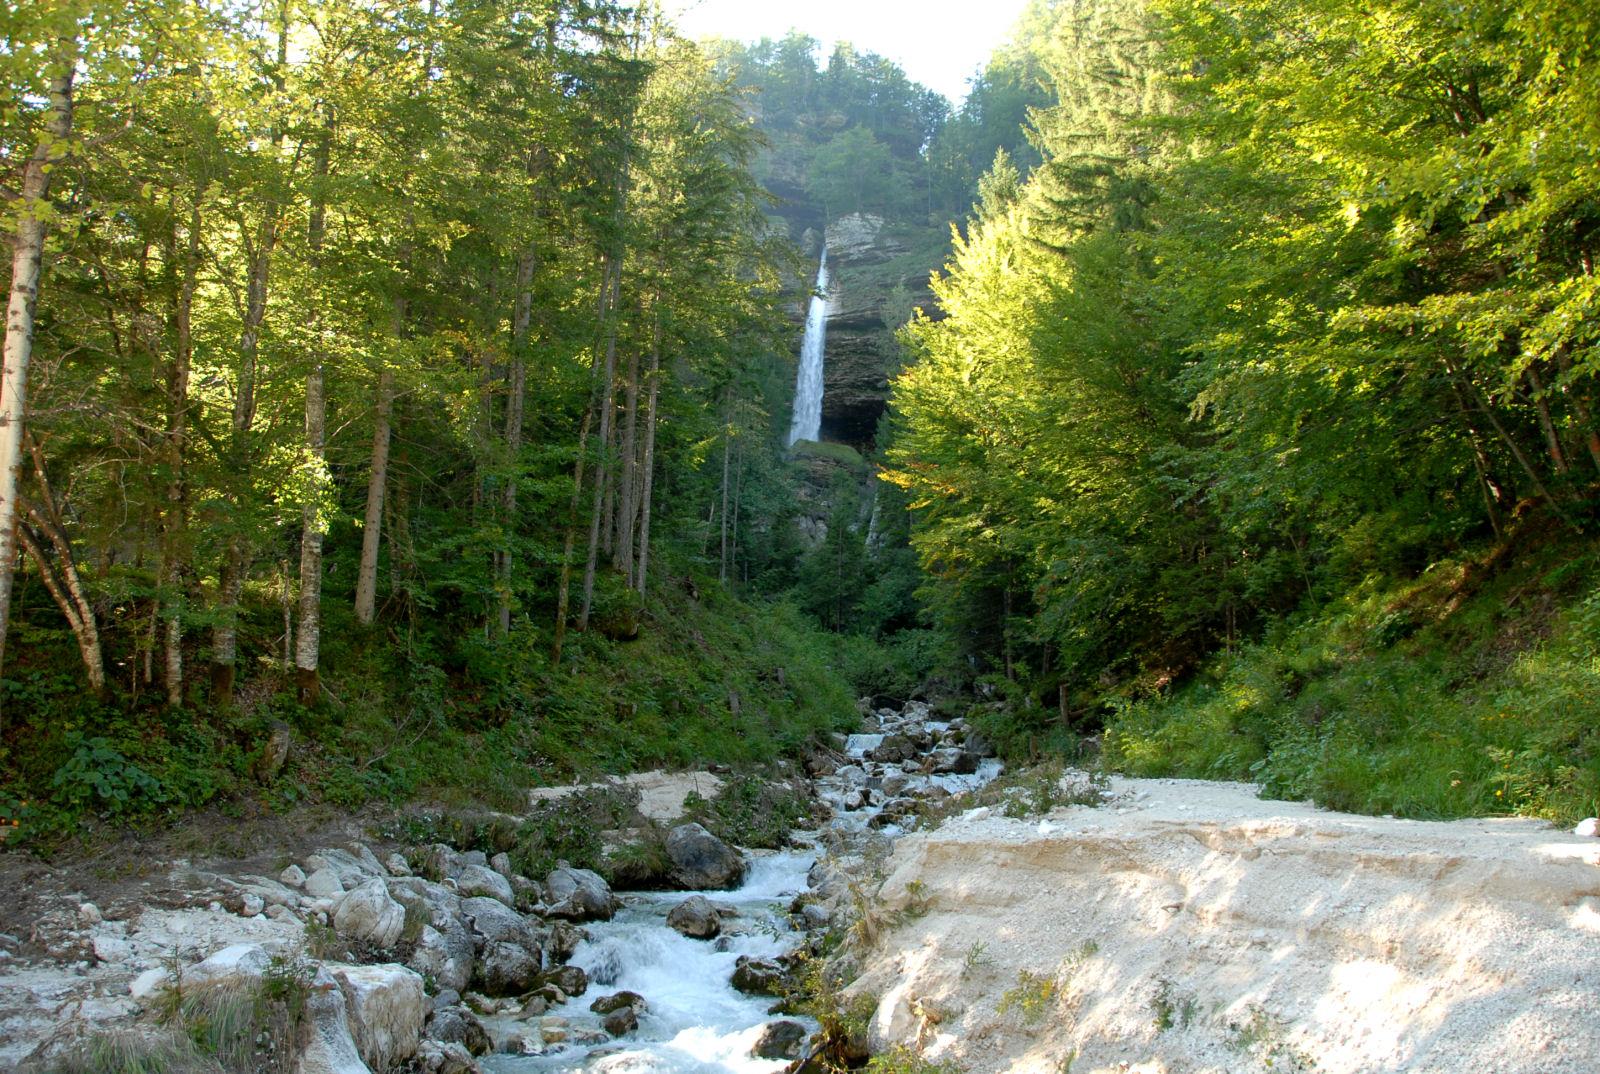 Pericnik waterfall, Gorenjska, Slovenia